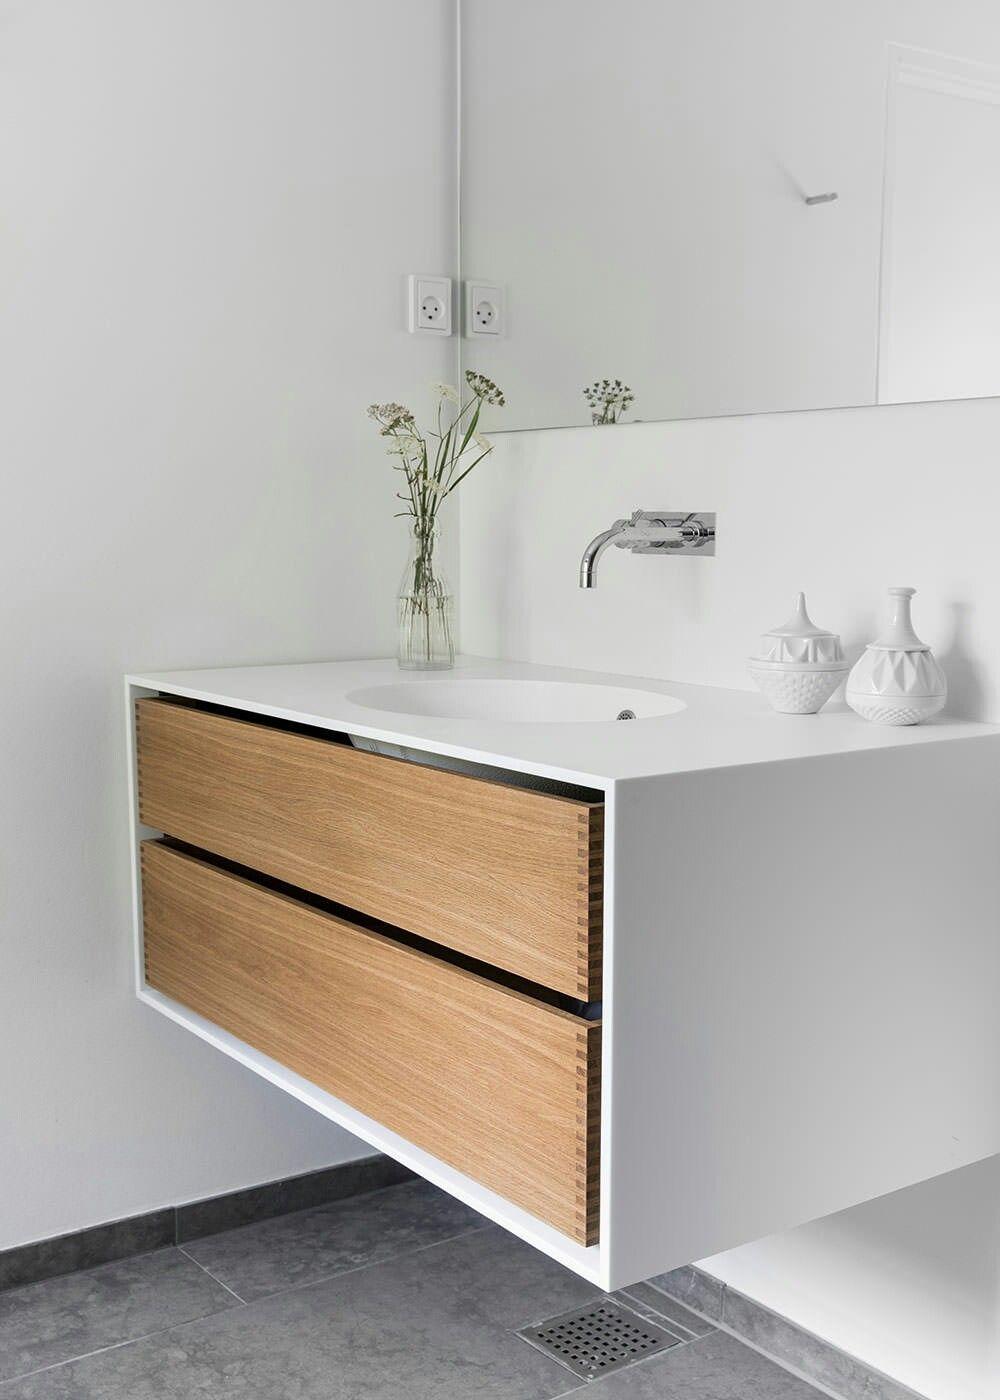 Cabinet maker bespoke pine furniture oak furniture bespoke - Bespoke Bathroom Furniture From Garde Hvalsoe In Oak Wood The Cabinet And Tabletop Are Made